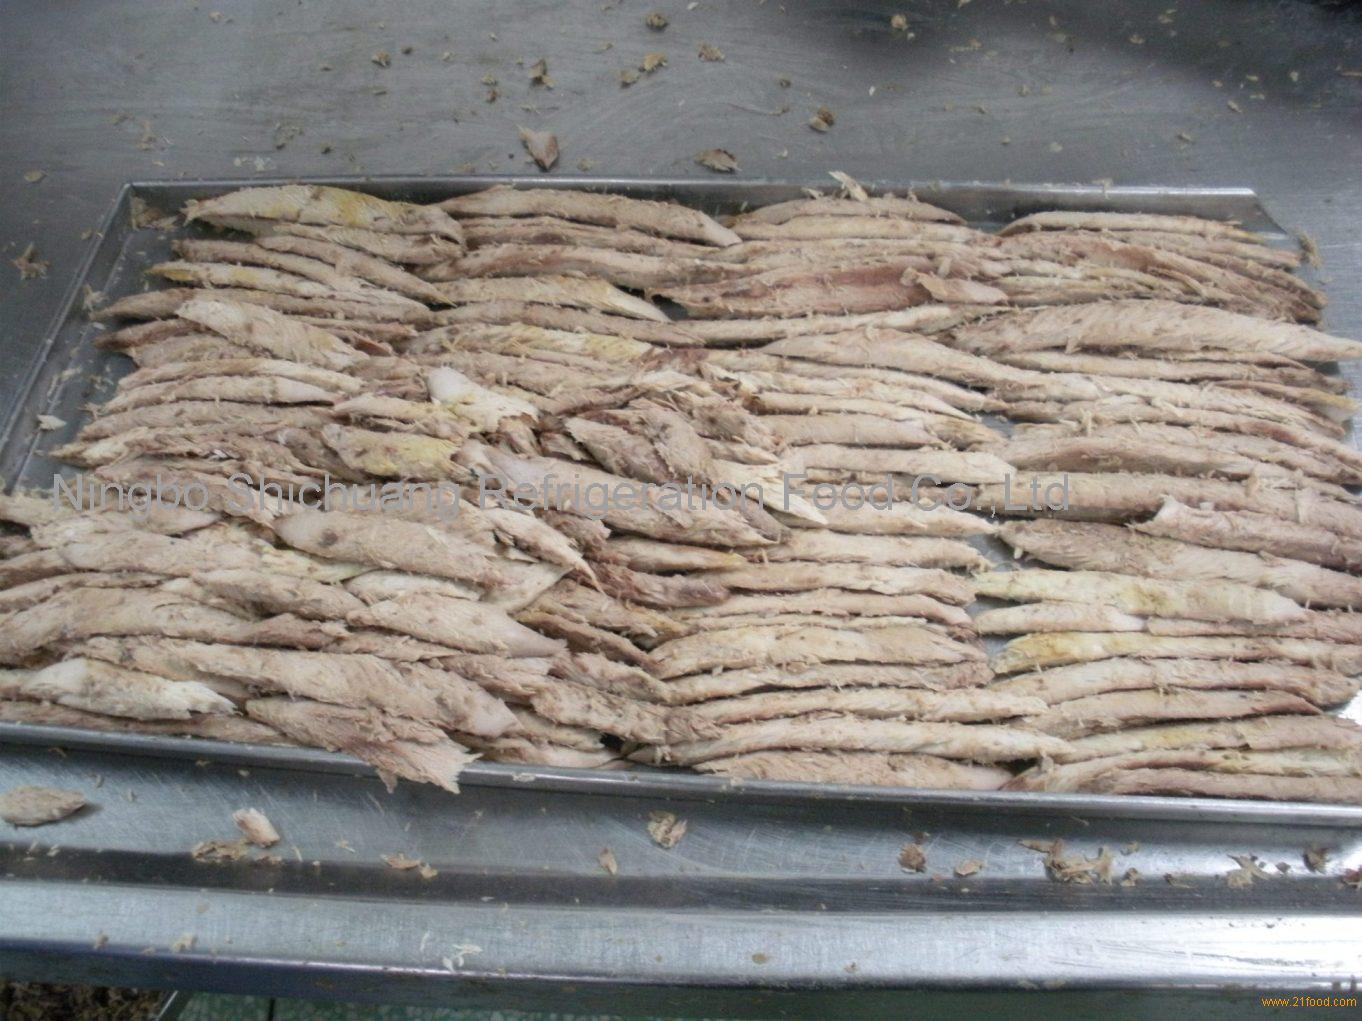 Bonito Cooked Loin